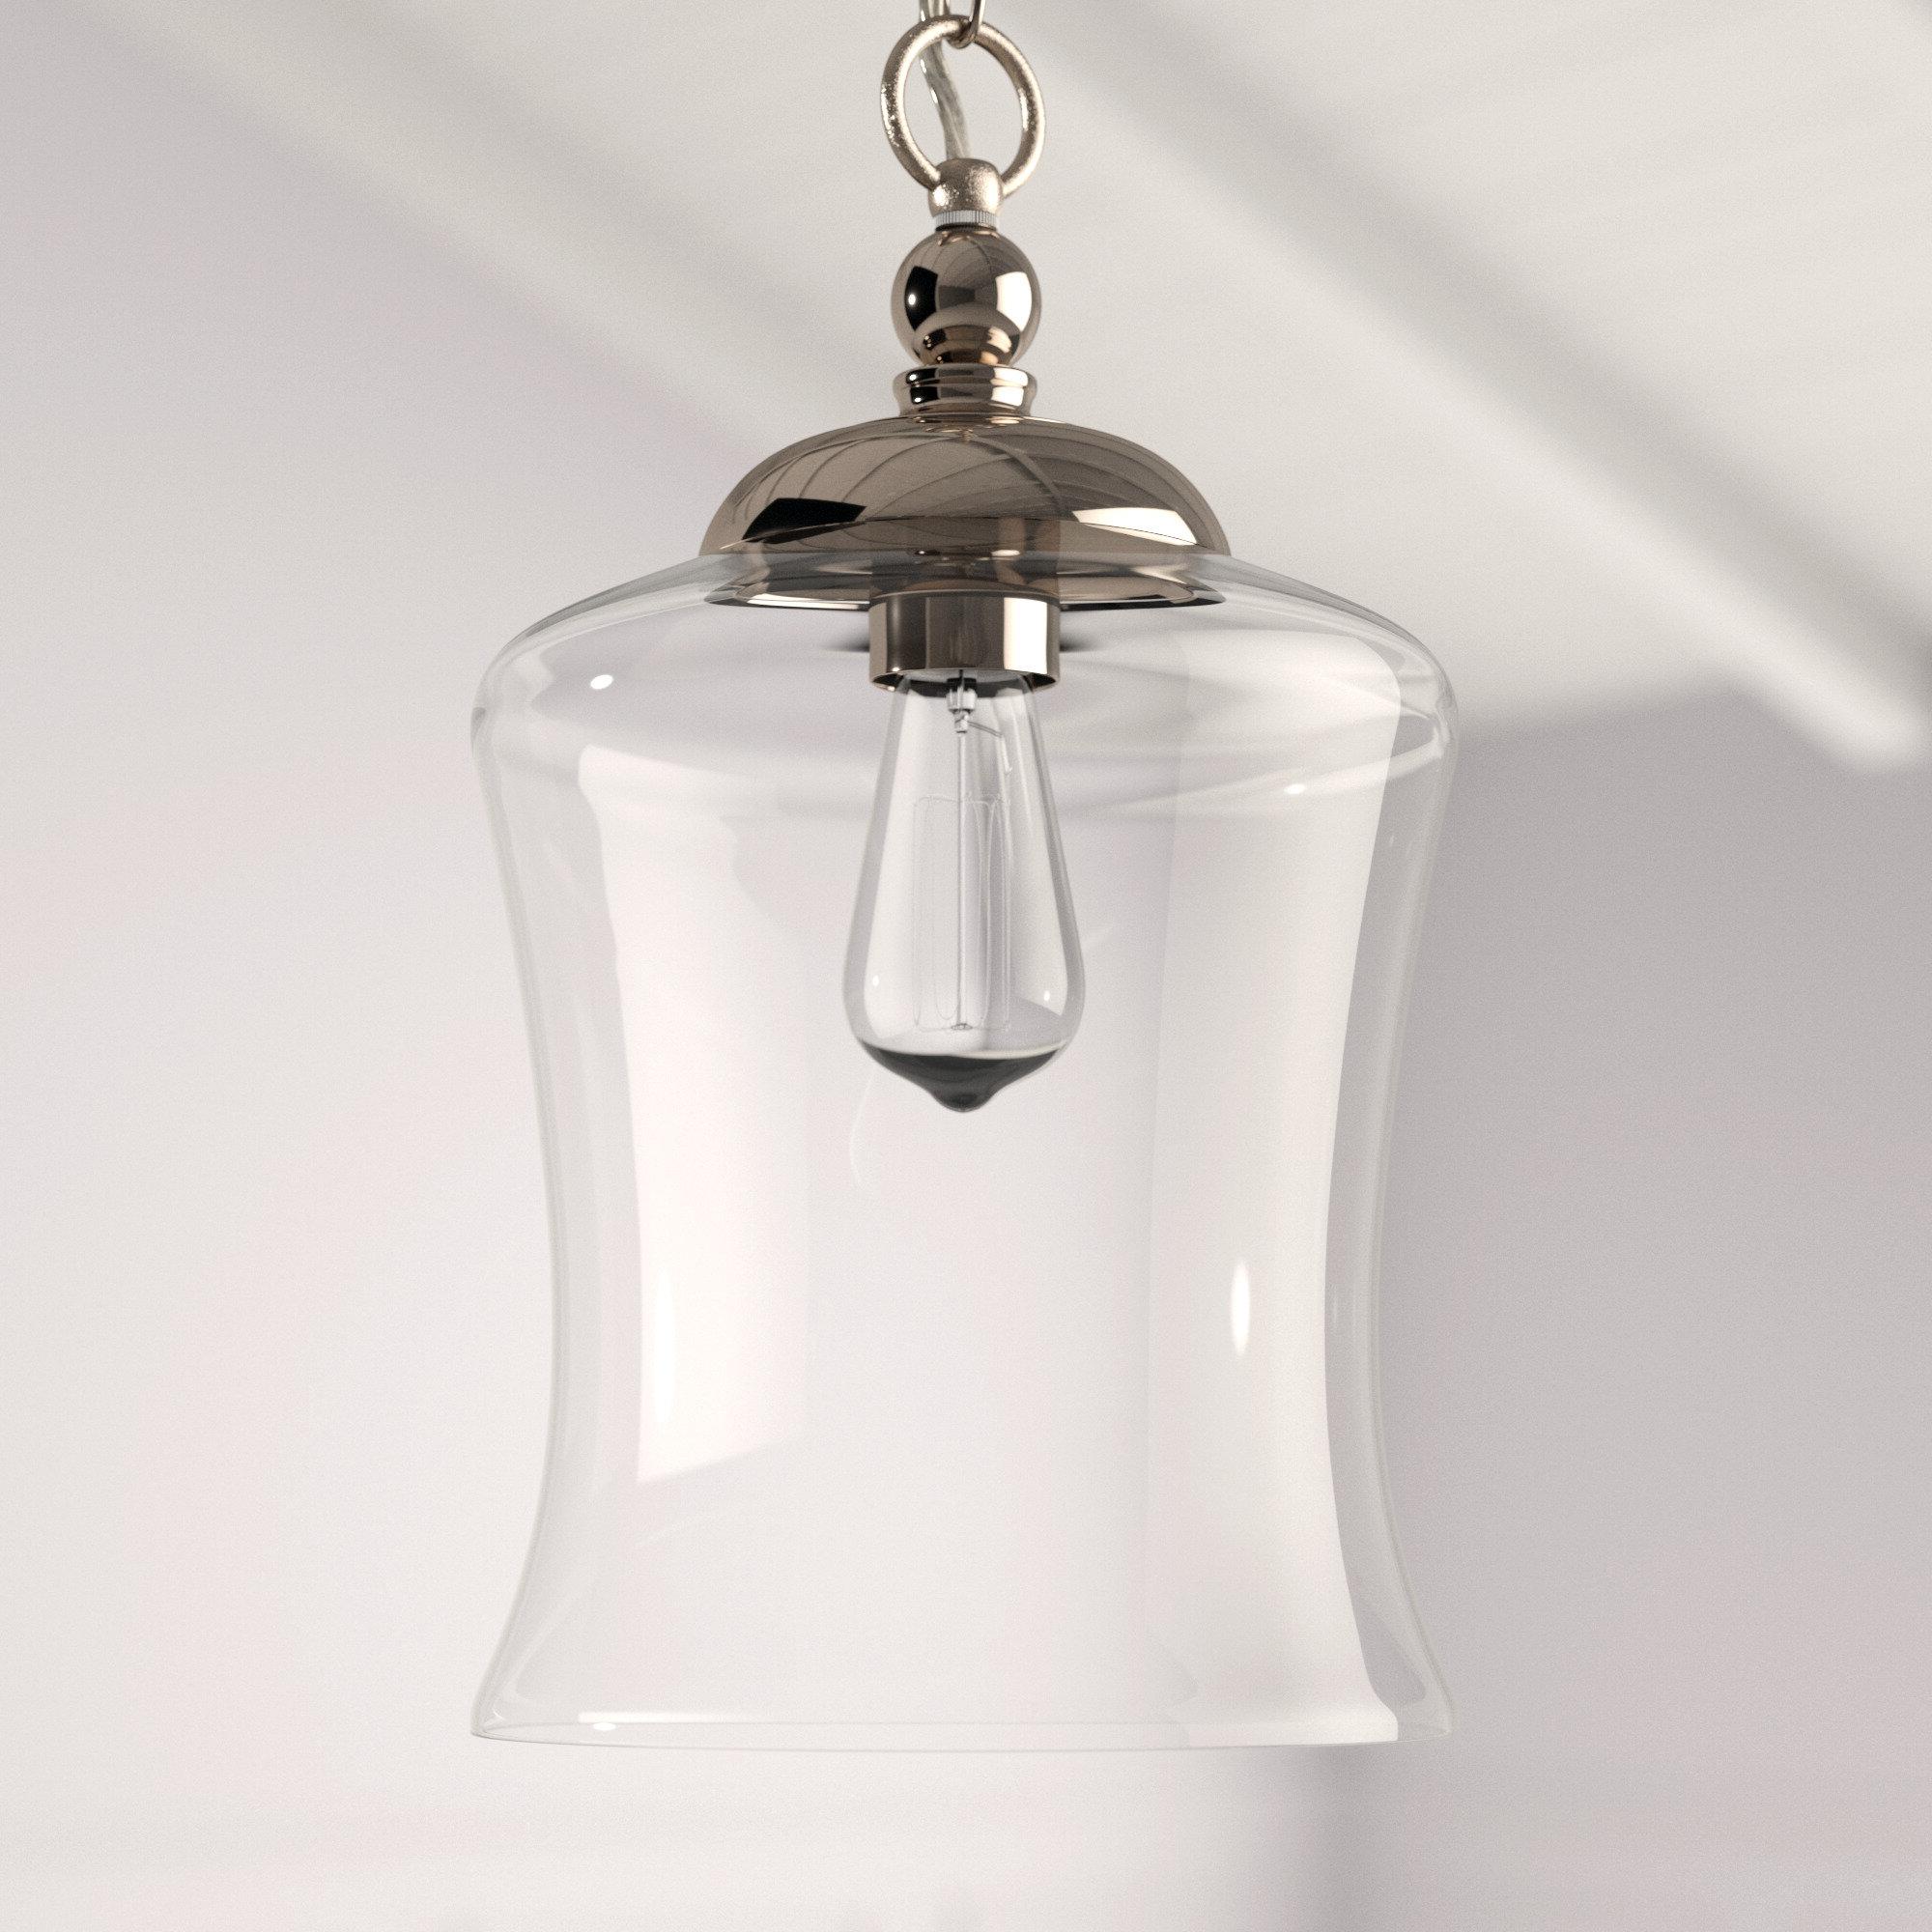 2020 Wentzville 1 Light Single Bell Pendant Pertaining To Sargent 1 Light Single Bell Pendants (Gallery 13 of 20)